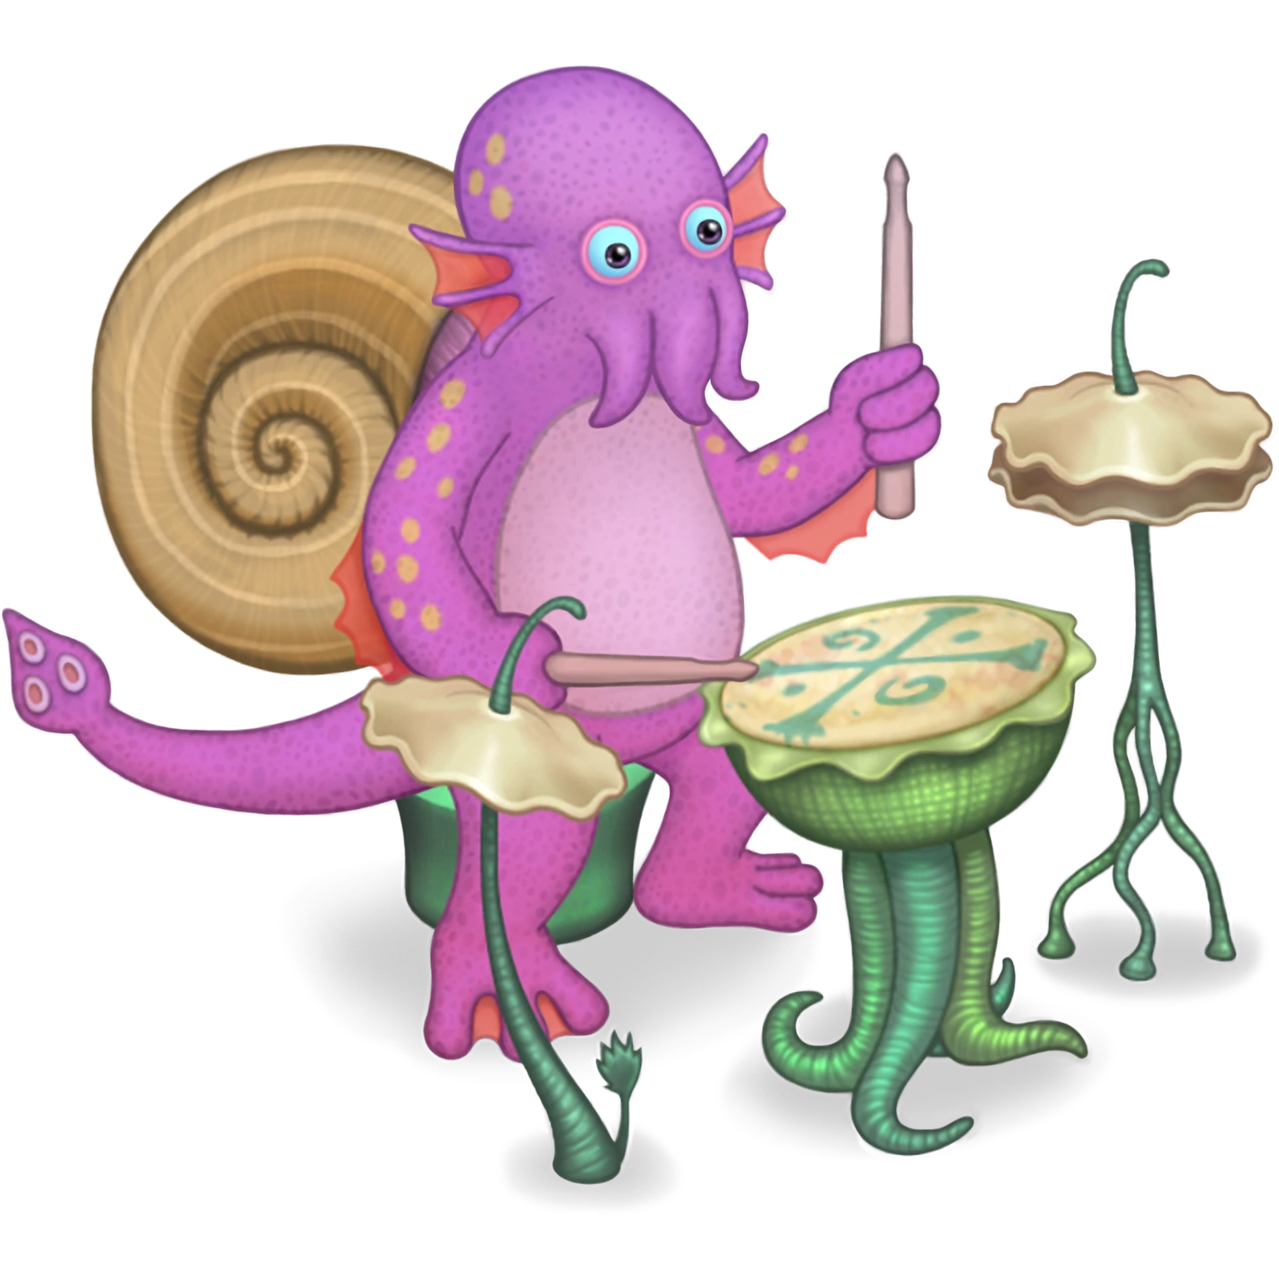 Shellbeat - My Singing Monsters Wiki